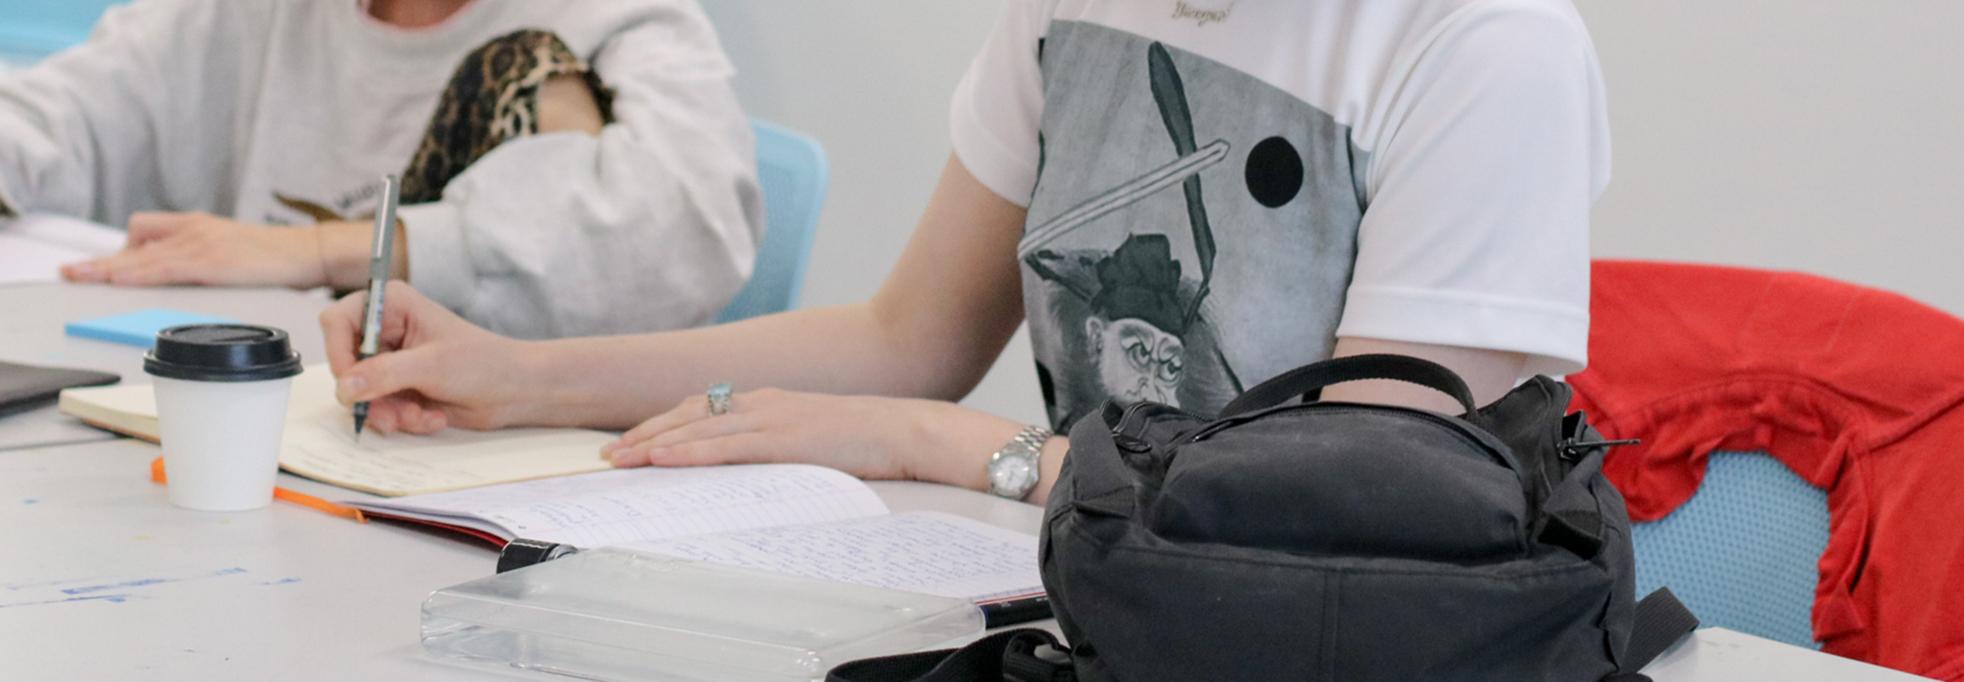 Screenwriting - Beginners